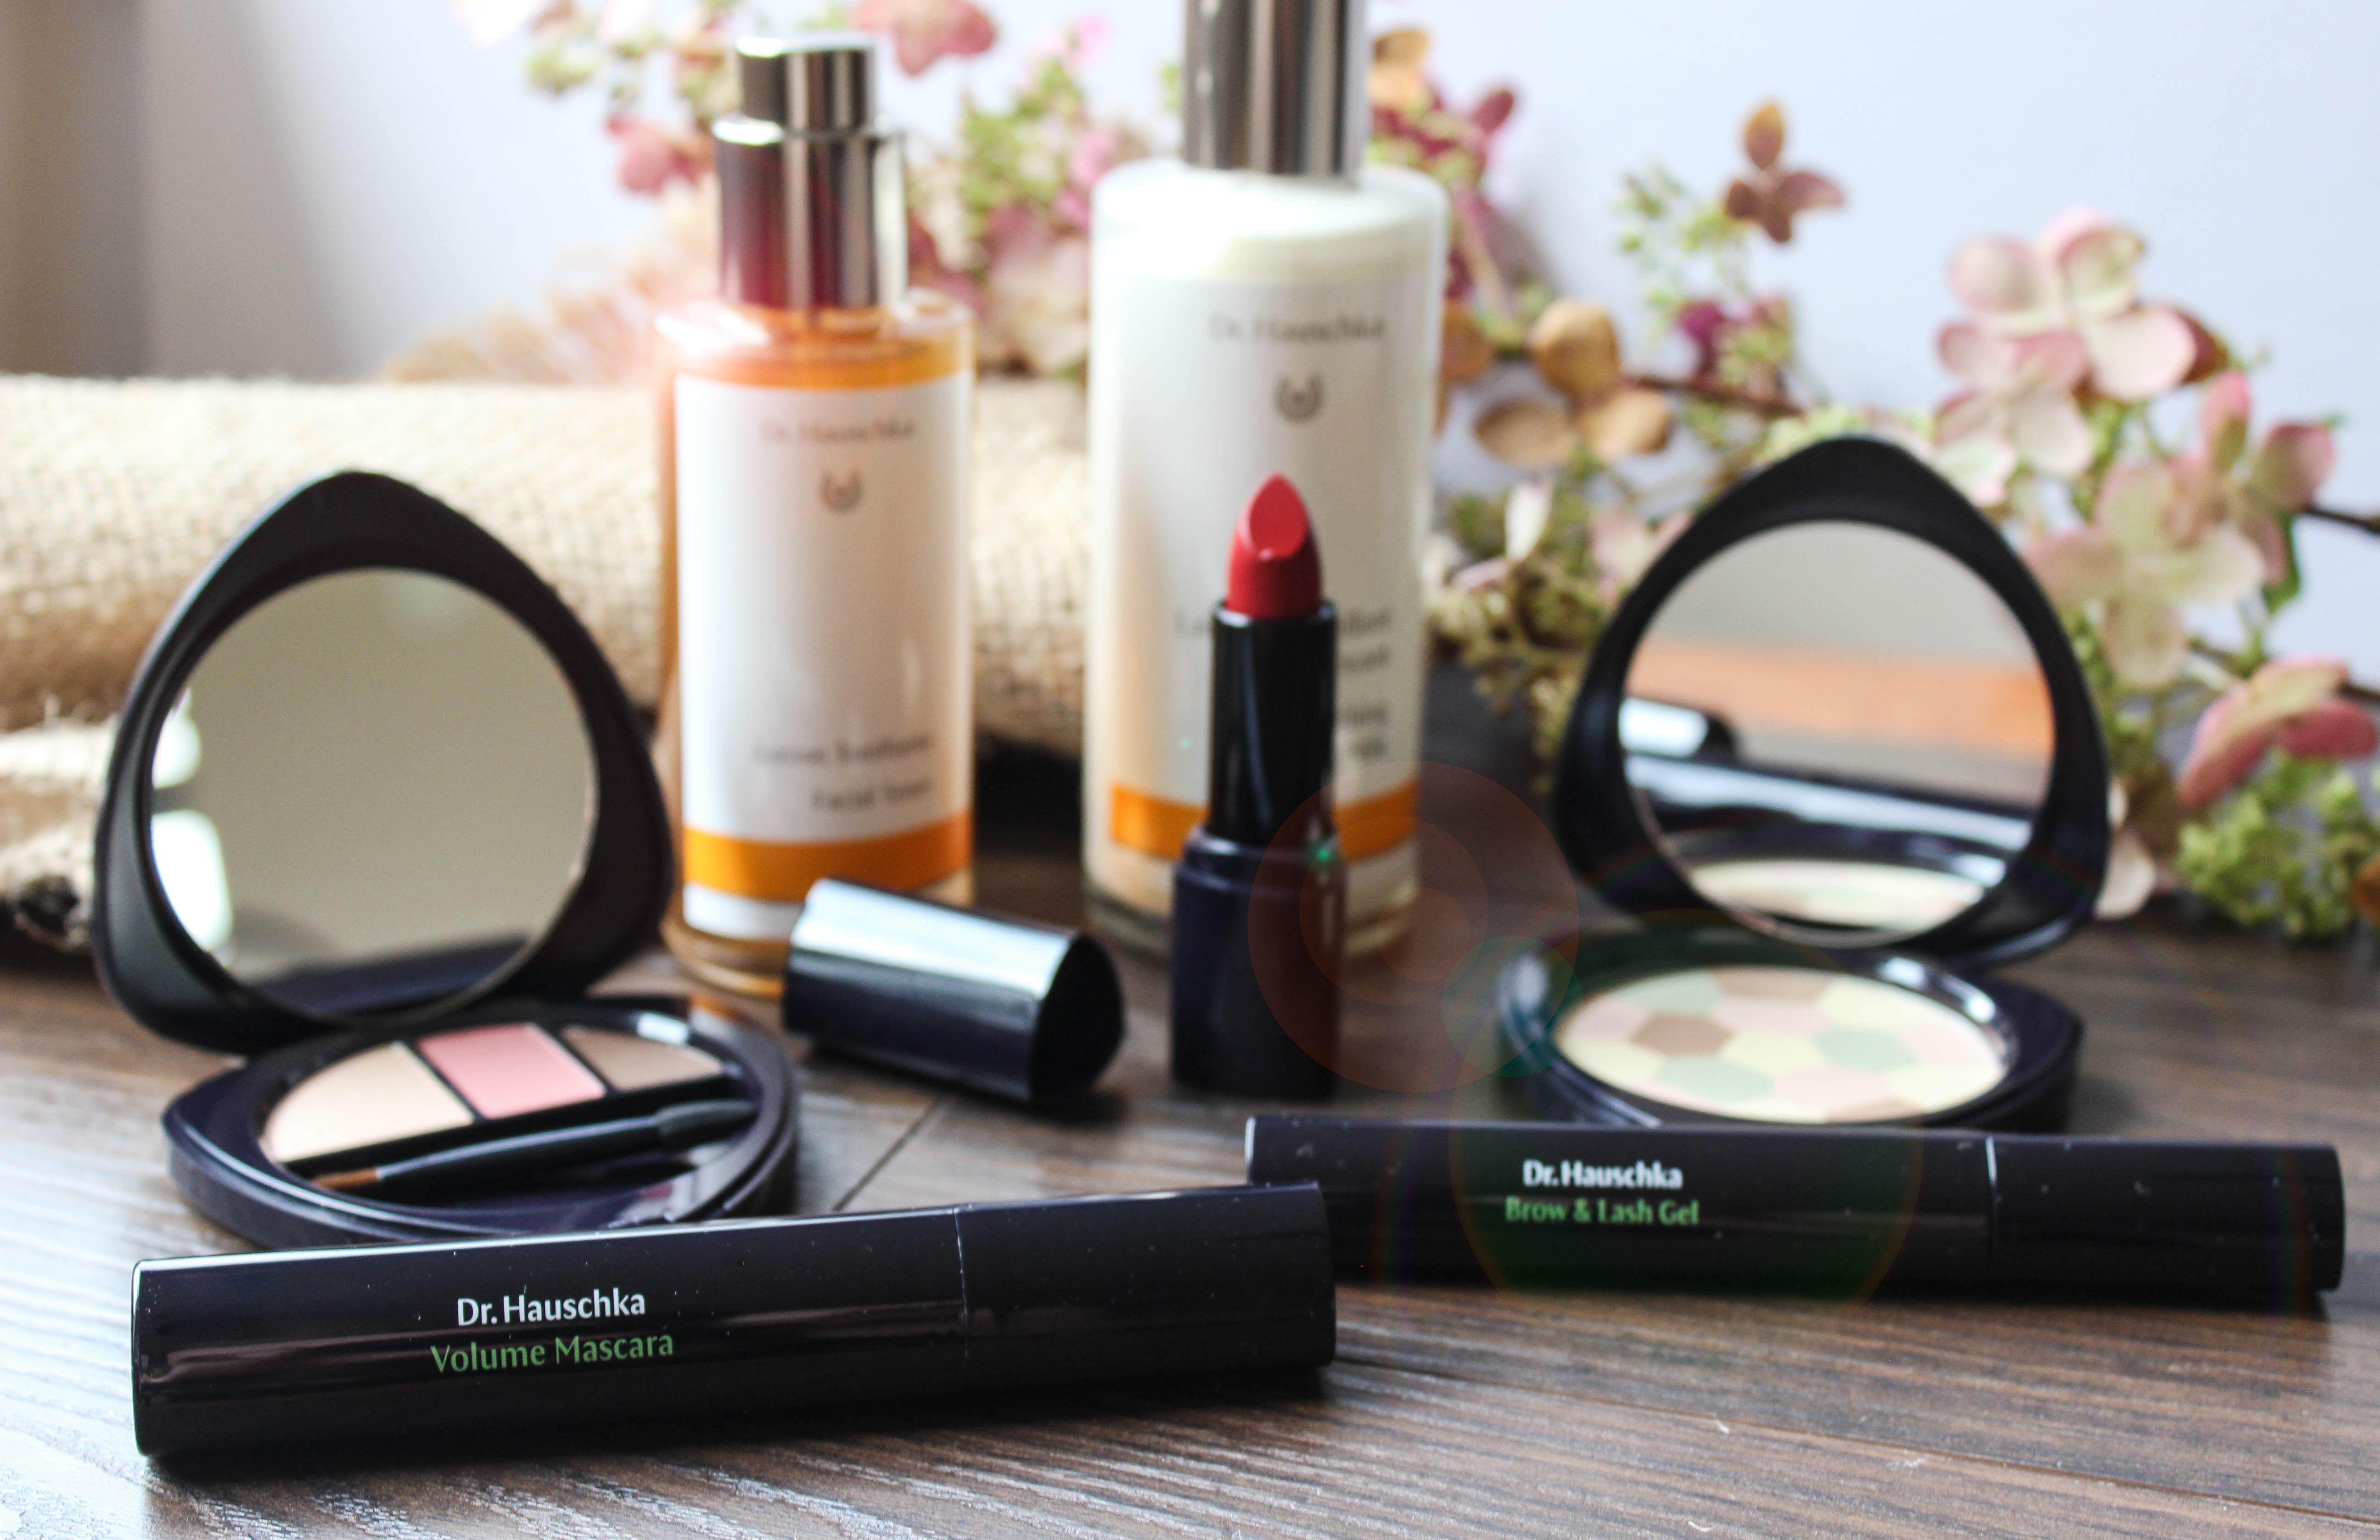 4067ed6f955 Dr.Hauschka Volume Mascara Review | Green Beauty | Sustainably Savvy